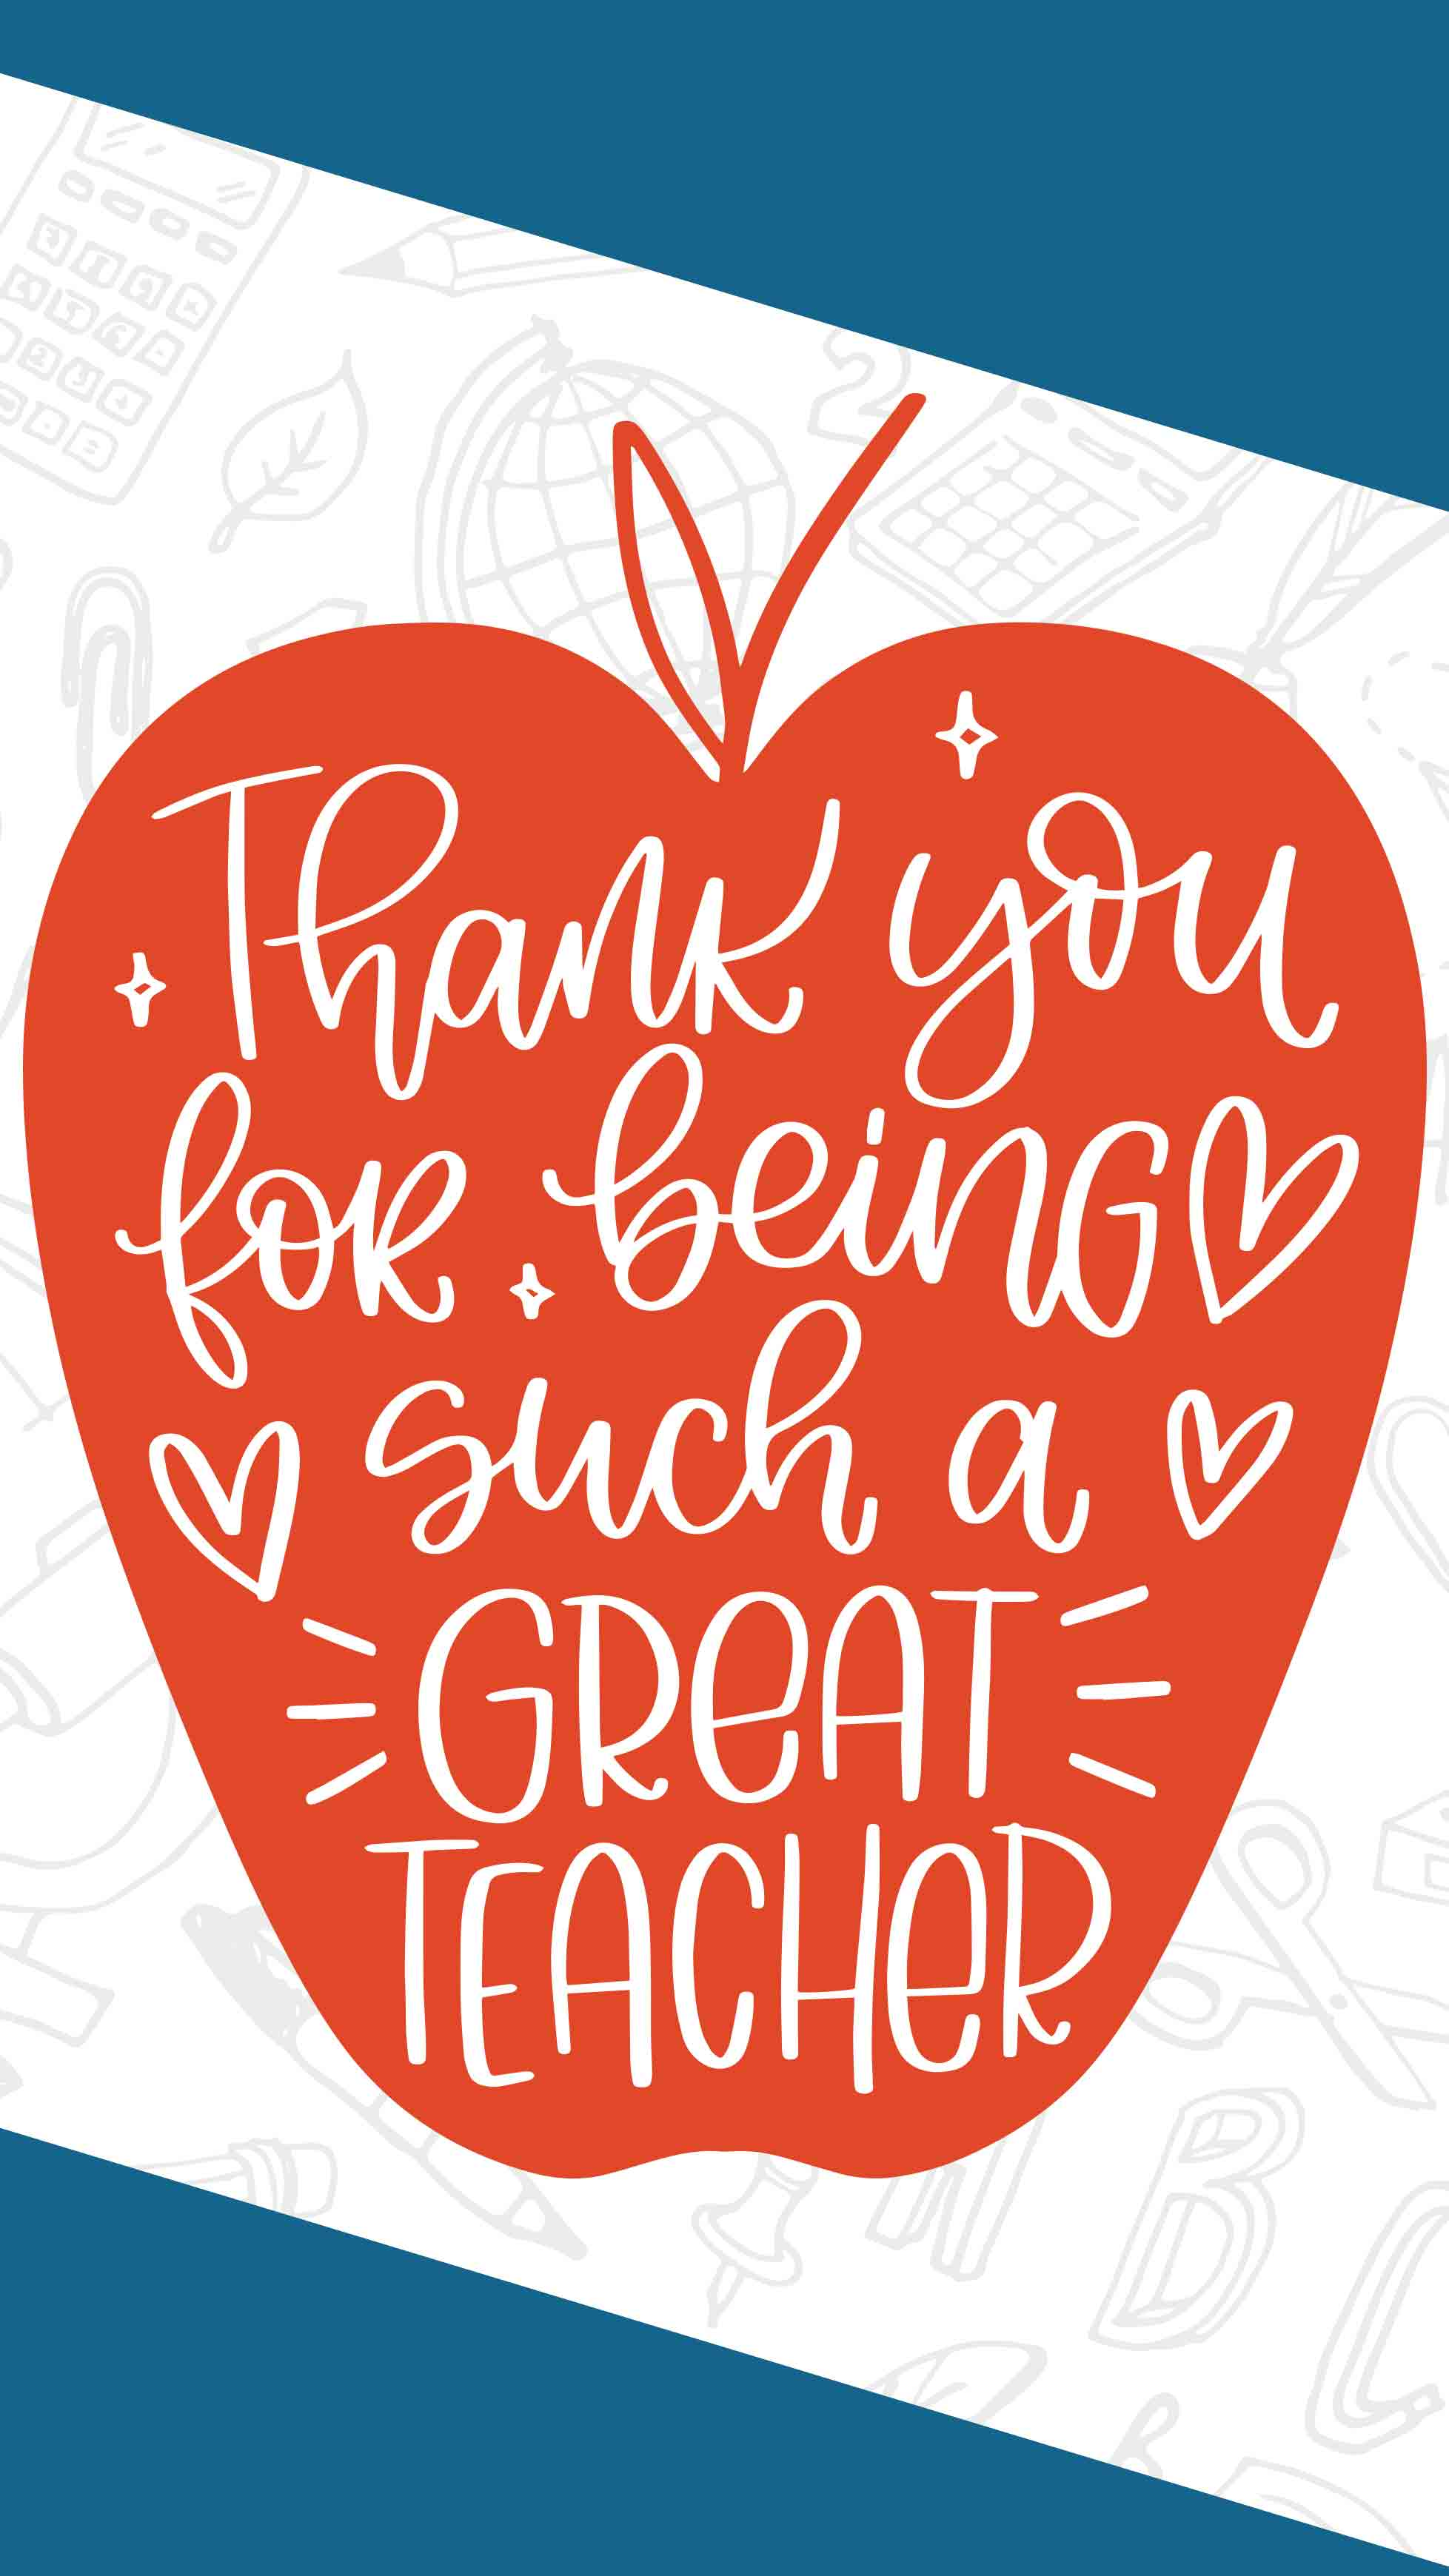 Great Teacher II